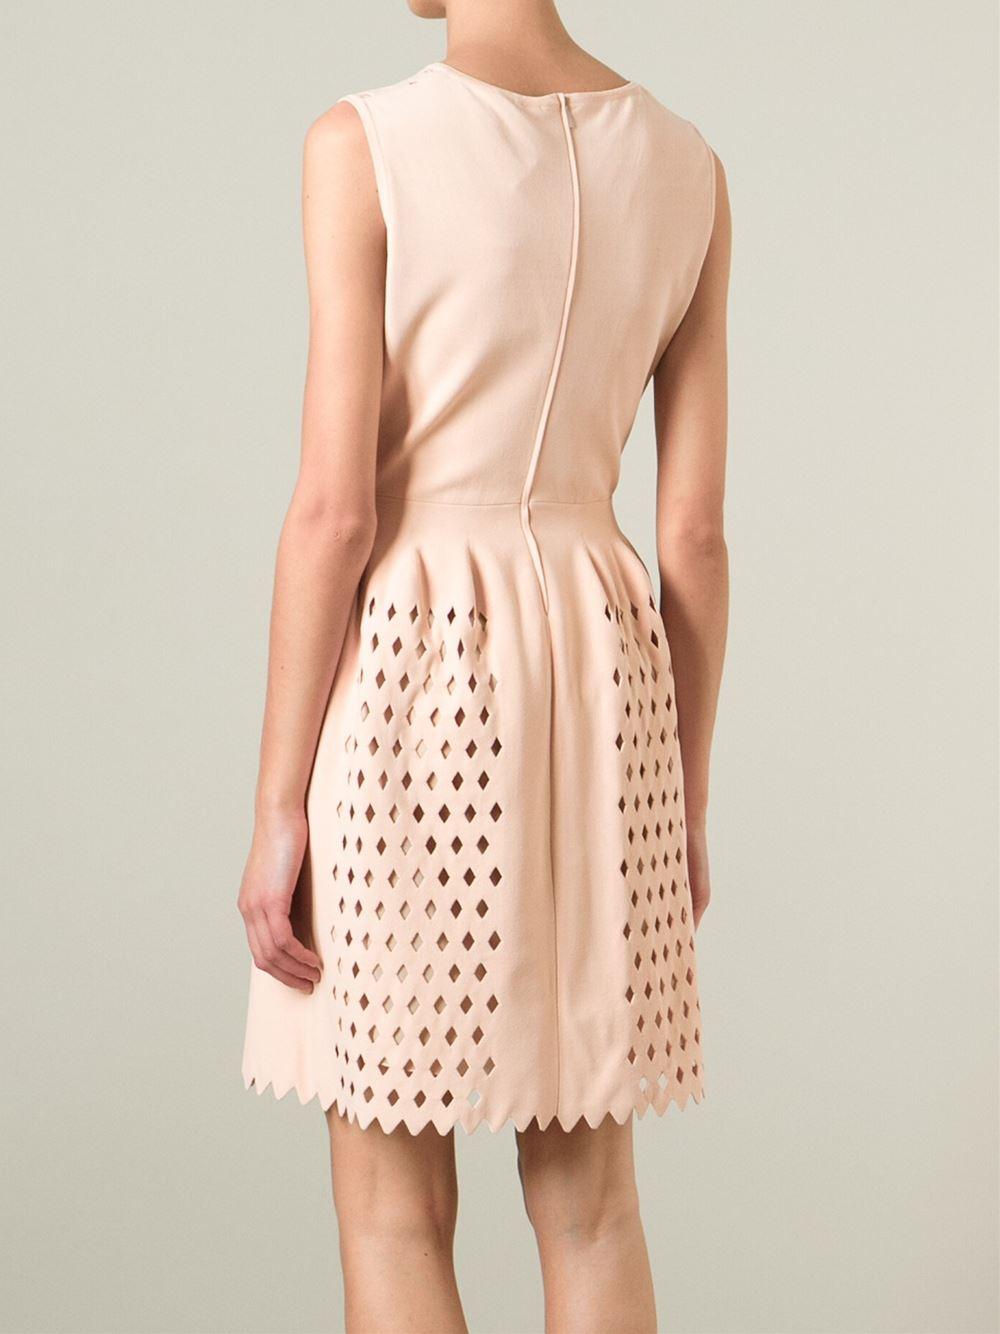 Lyst Fendi Cut Out Dress In Pink